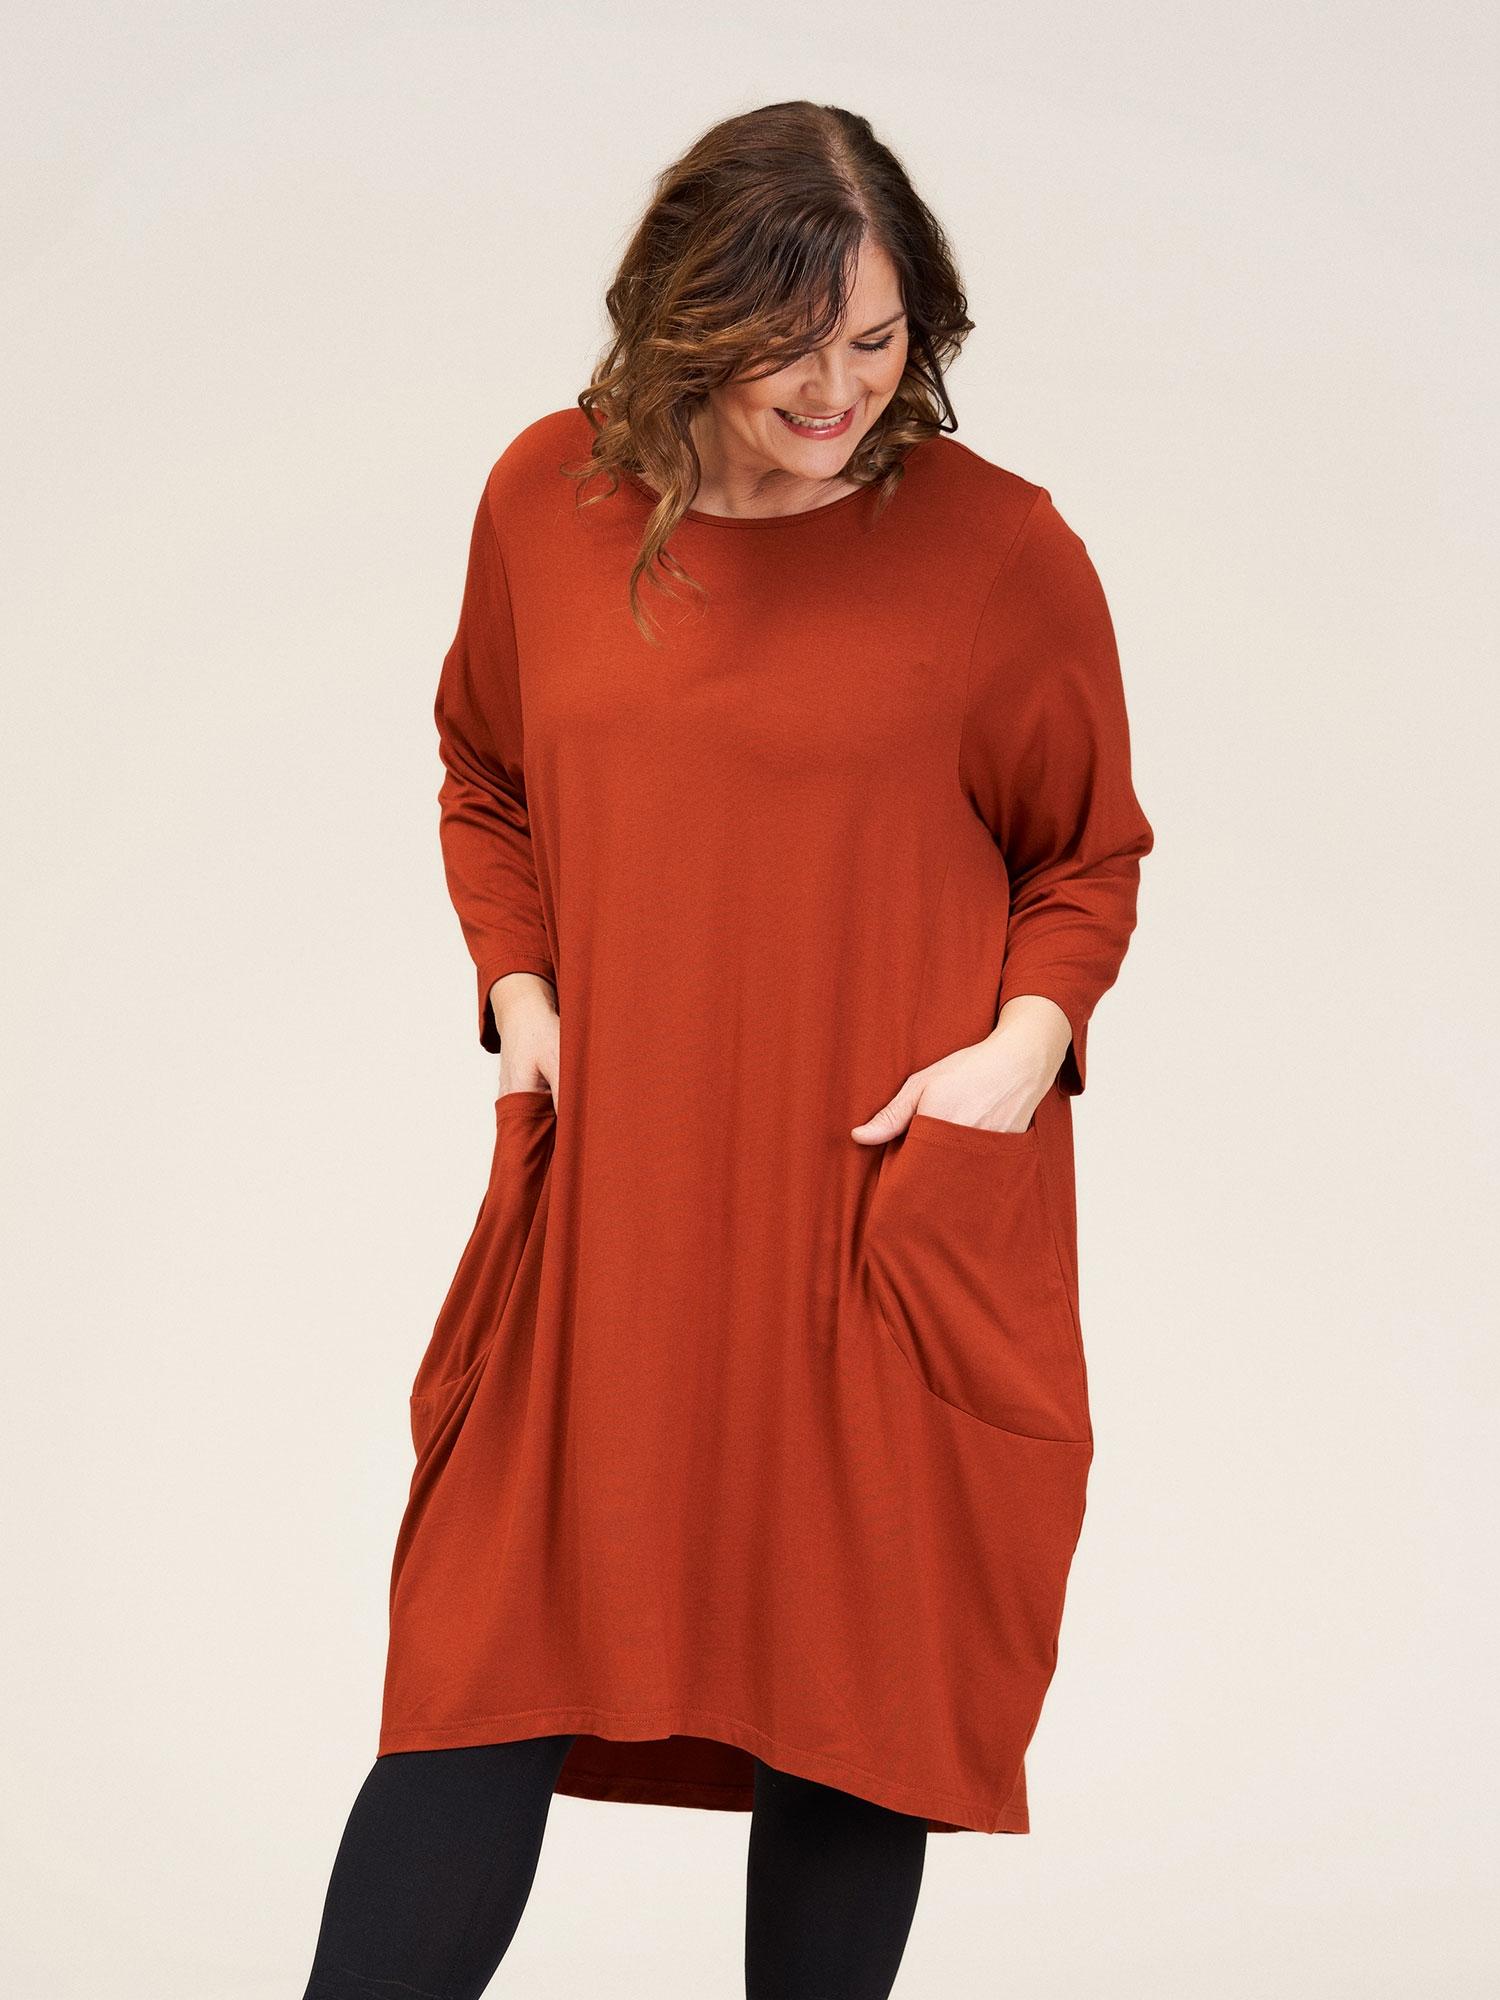 Gozzip Orange jersey kjole med lommer og lange ærmer, 46-48 / M